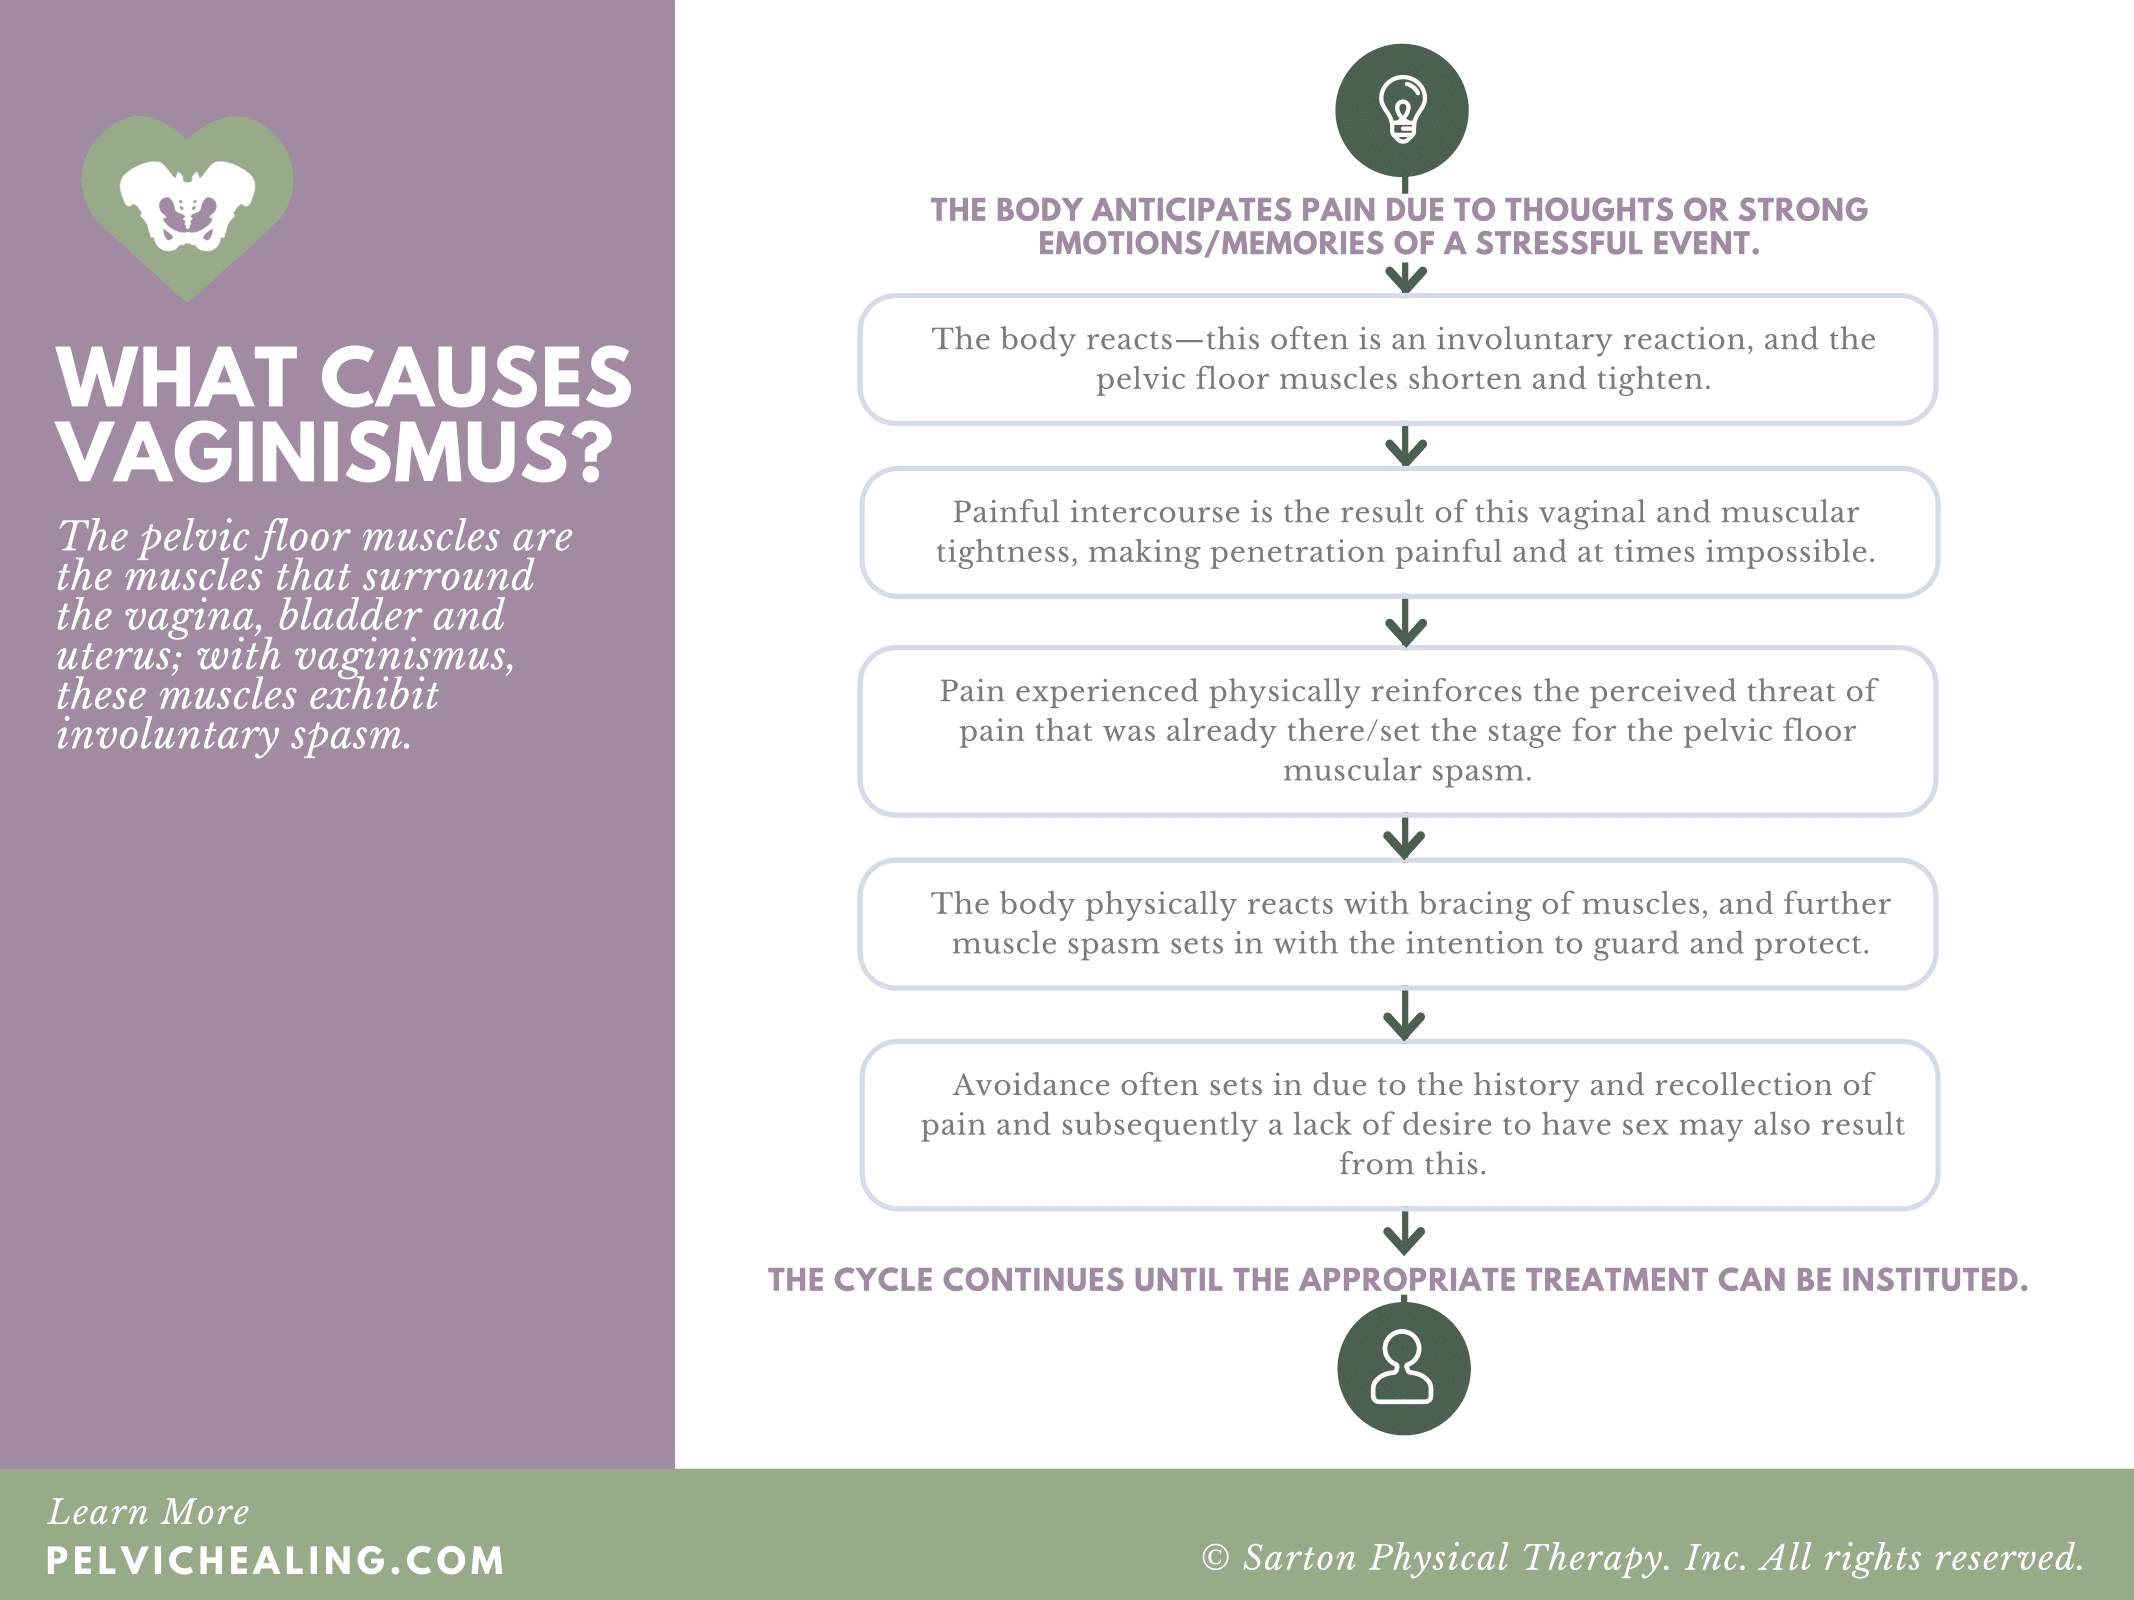 What Causes Vaginismus?